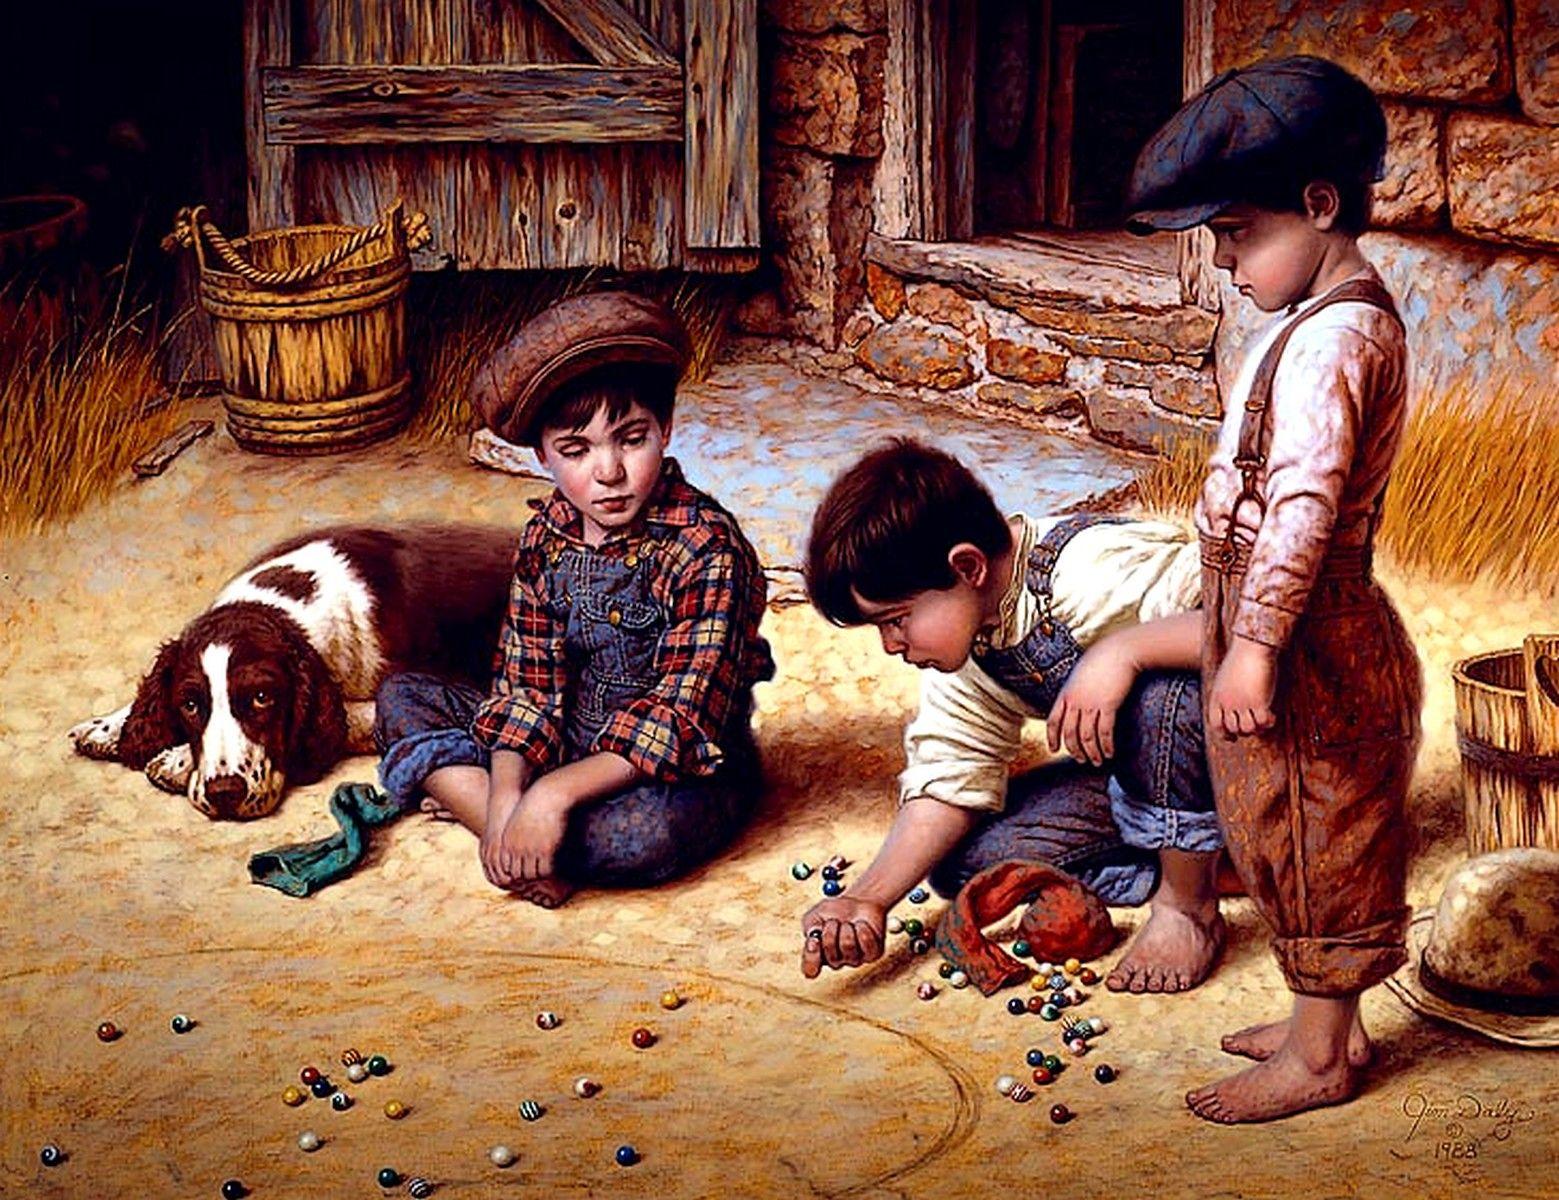 Jim daly art art painting painting